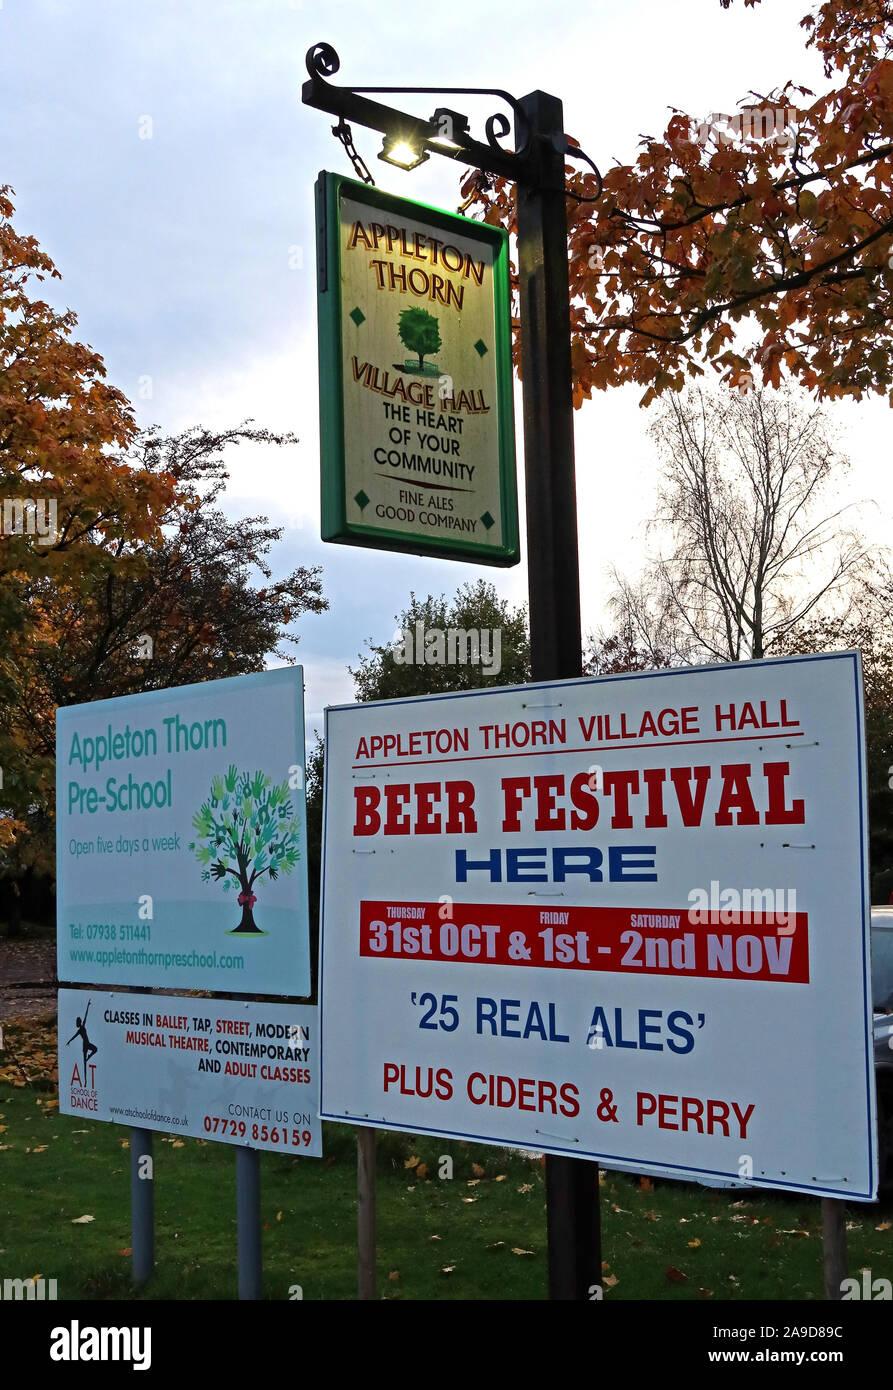 @HotpixUK,HotpixUK,GoTonySmith,Village,evening,night,nighttime,England,UK,North West England,Stretton Rd,Appleton Thorn,Warrington WA4 4RT,Stretten Road,Cheshire,WA4 4RT,Appleton,CAMRA,award winning,Village hall,CAMRA award winning village hall,sign,outside,exterior,pub,bar,Thorn,Beer Festival,Appleton Thorn Beer Festival,Real Ales,ciders,perry,community